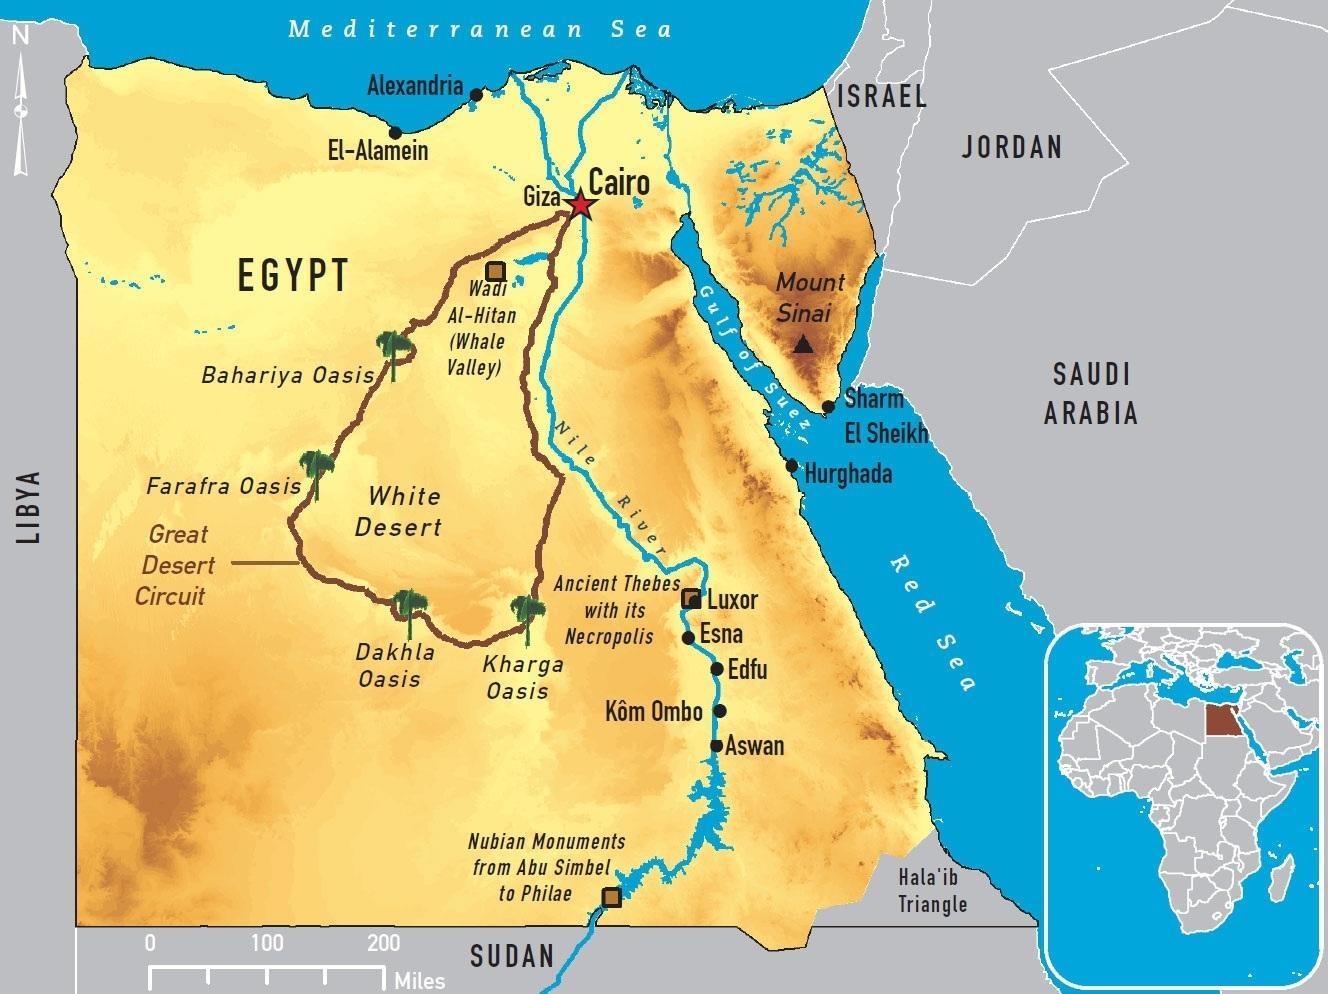 Cairo world map - Cairo map world (Egypt)